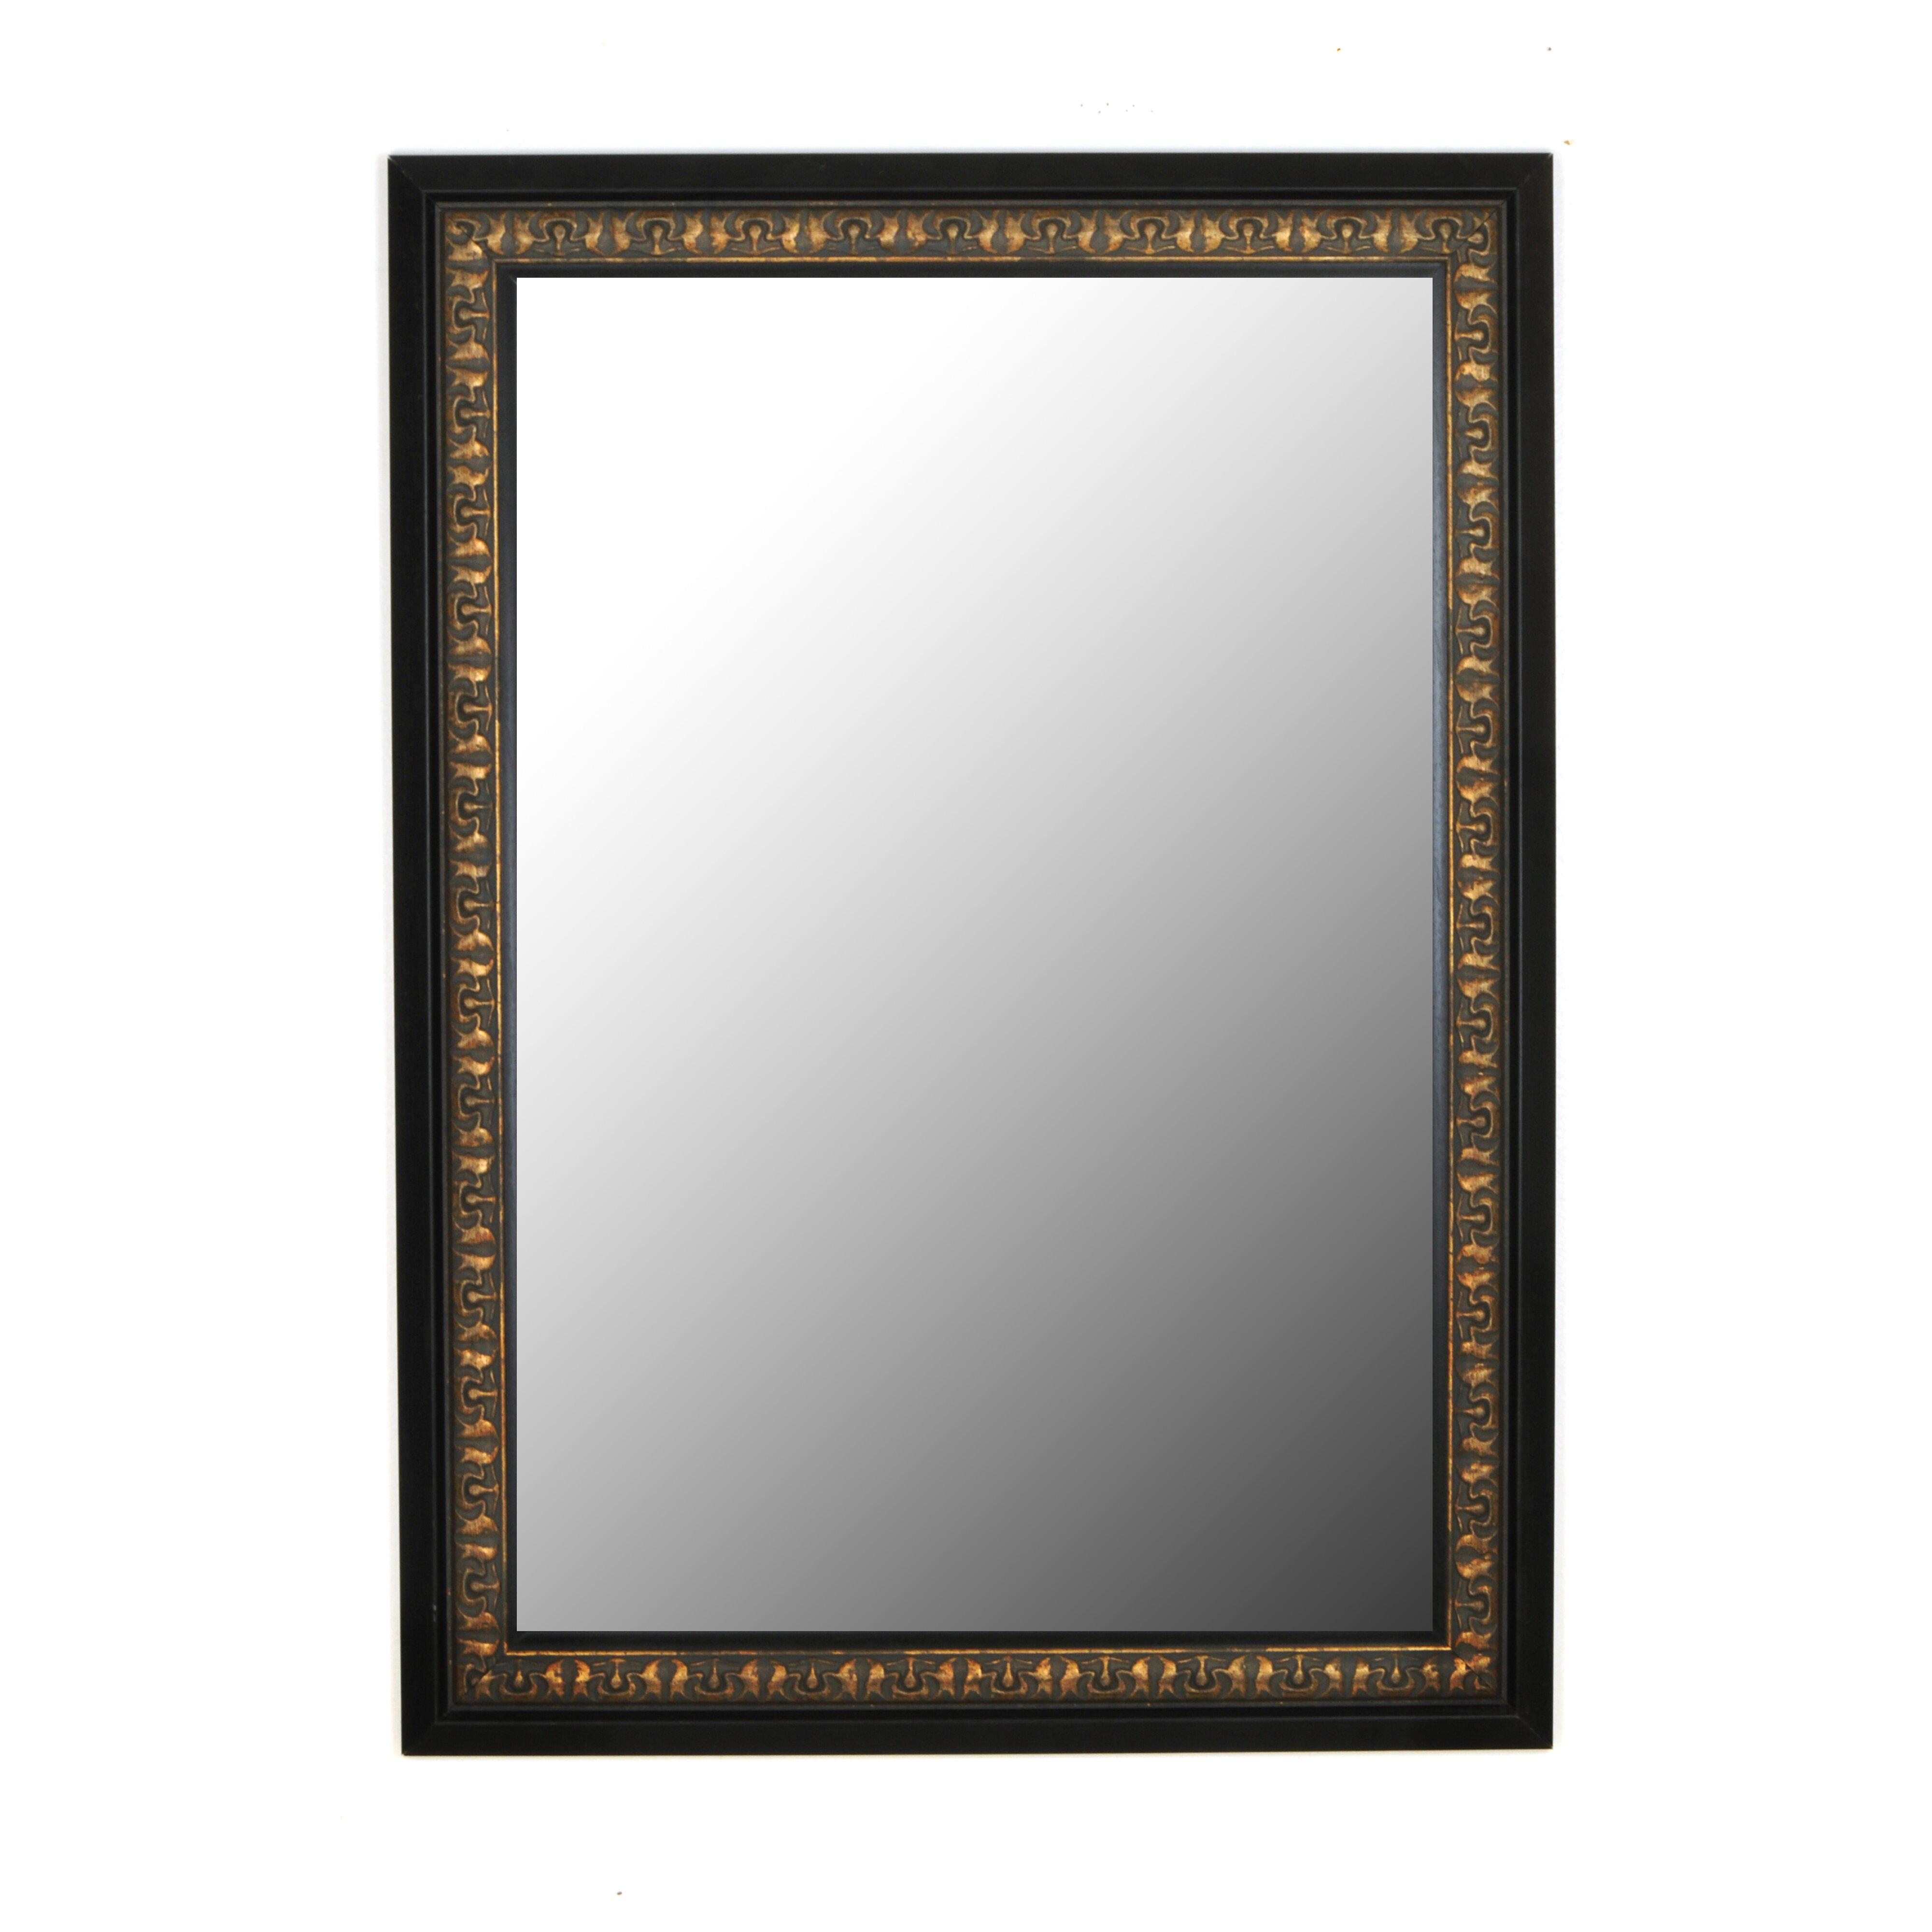 second look mirrors mumbai vintage copper black surround